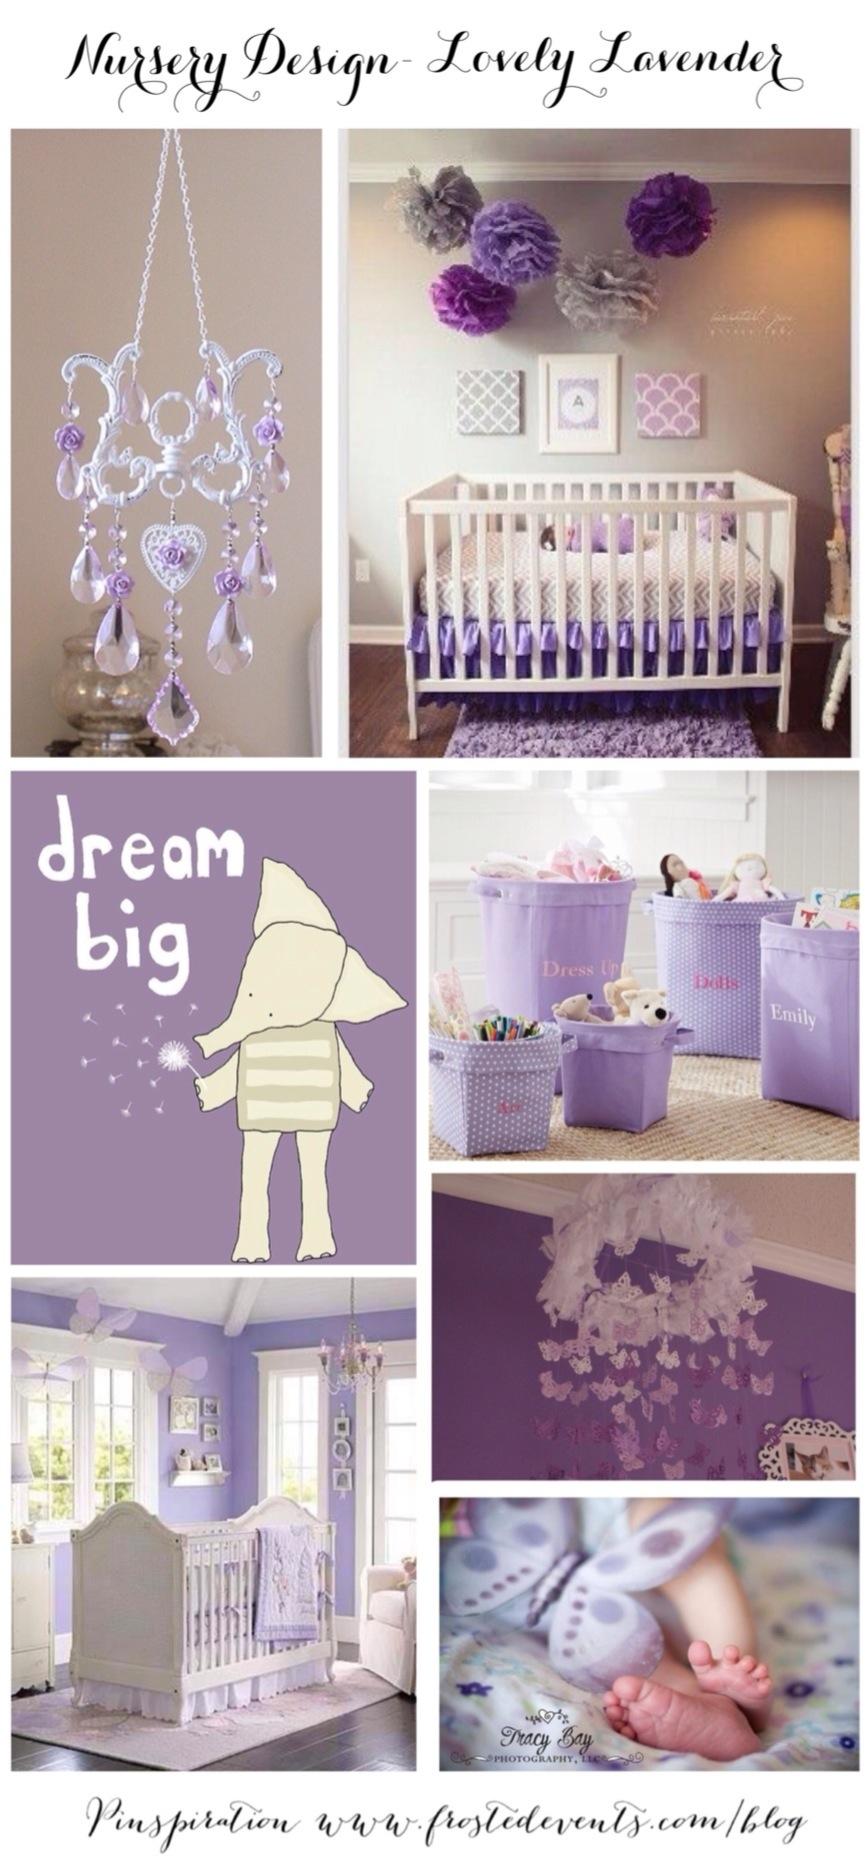 Pottery Barn baby nursery decor ideas and inspiration - Pottery Barn Kids